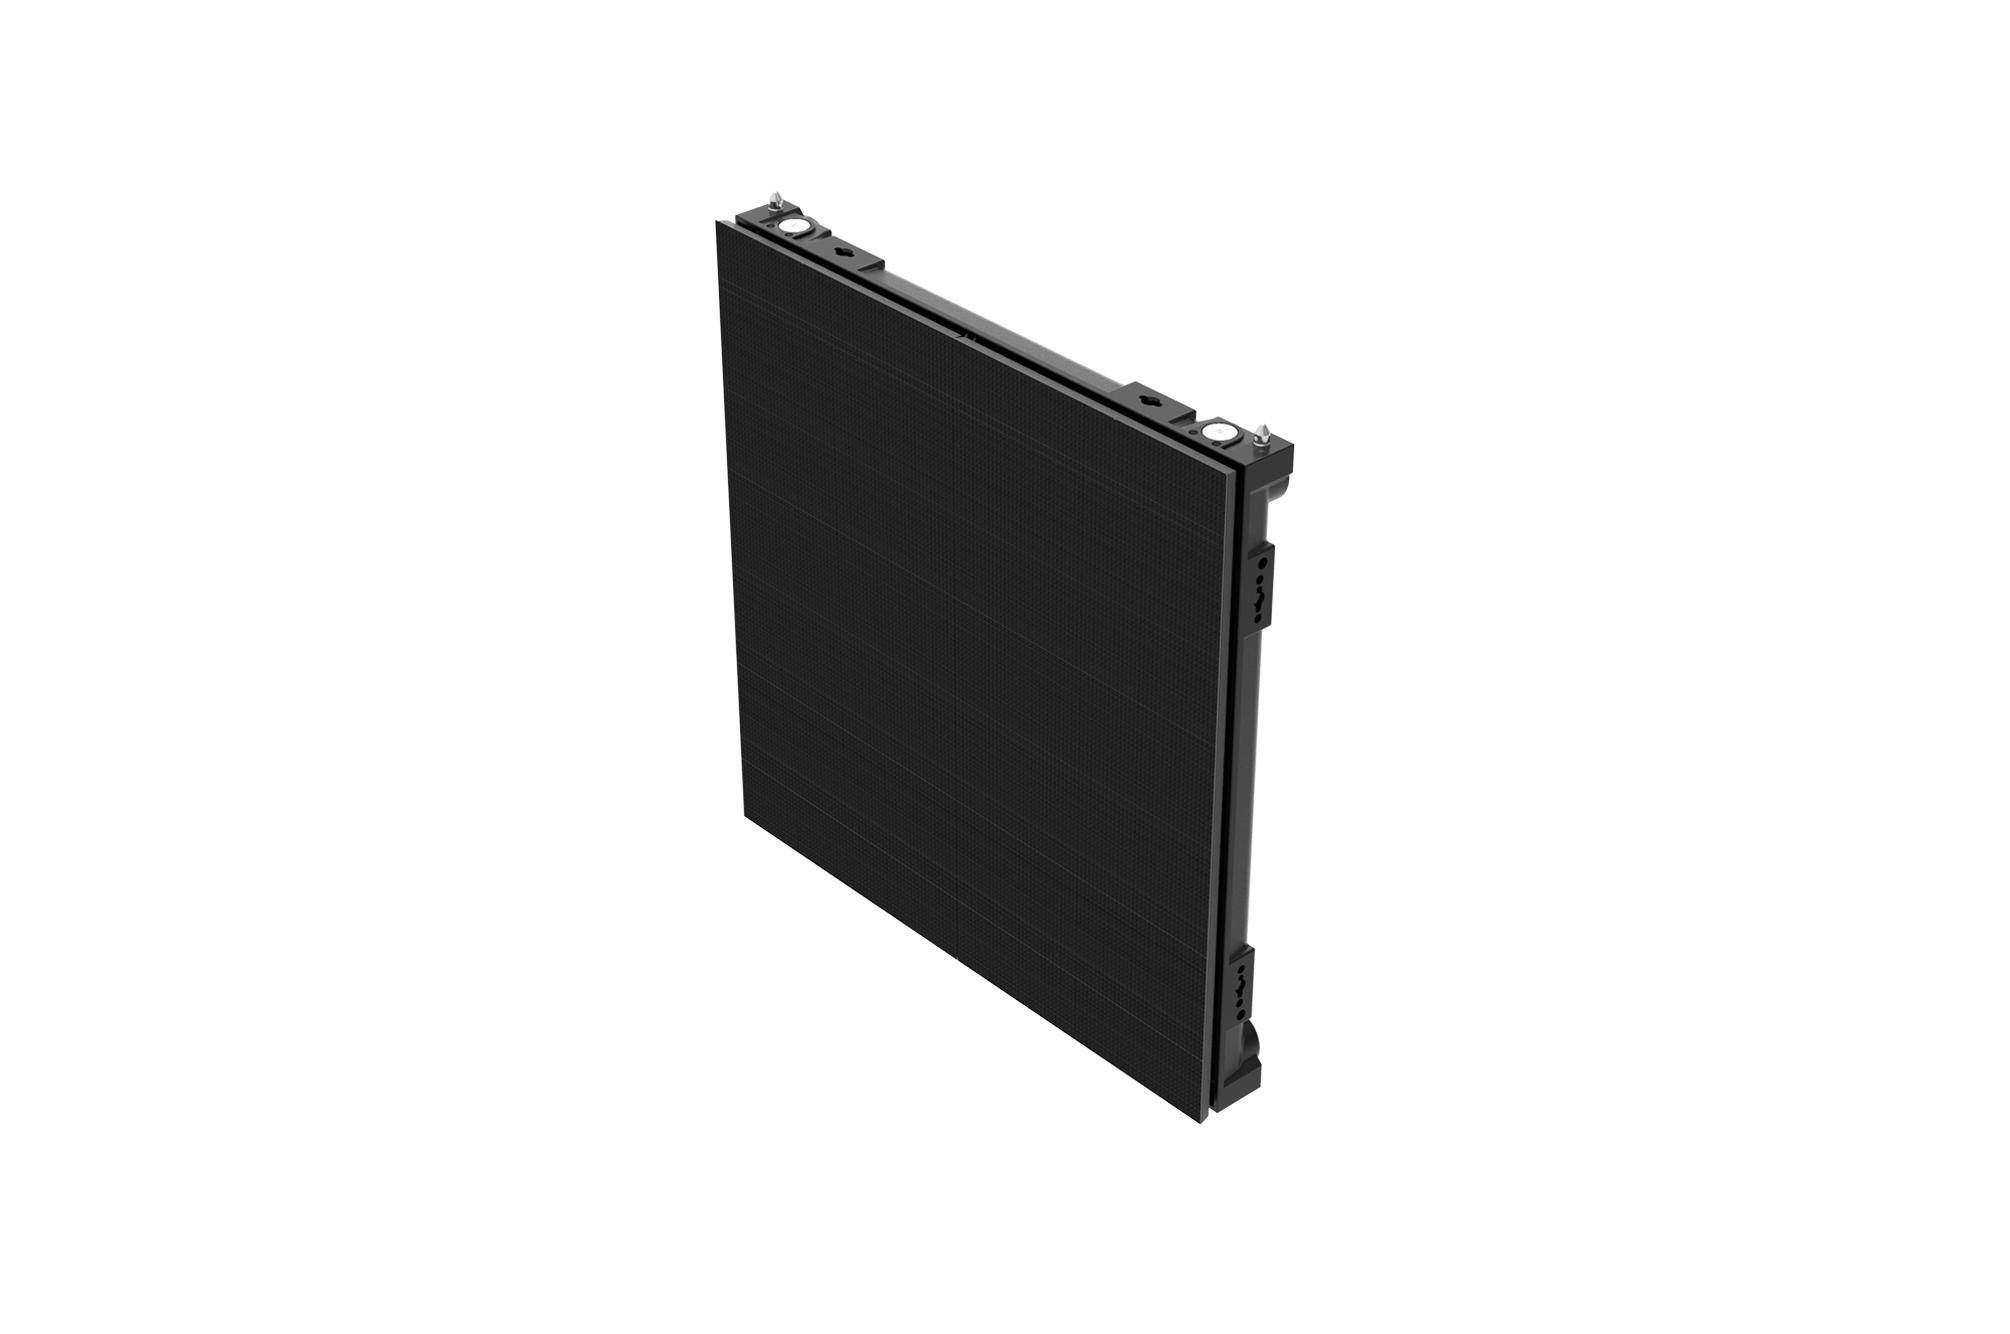 LG Versatile GSCA039